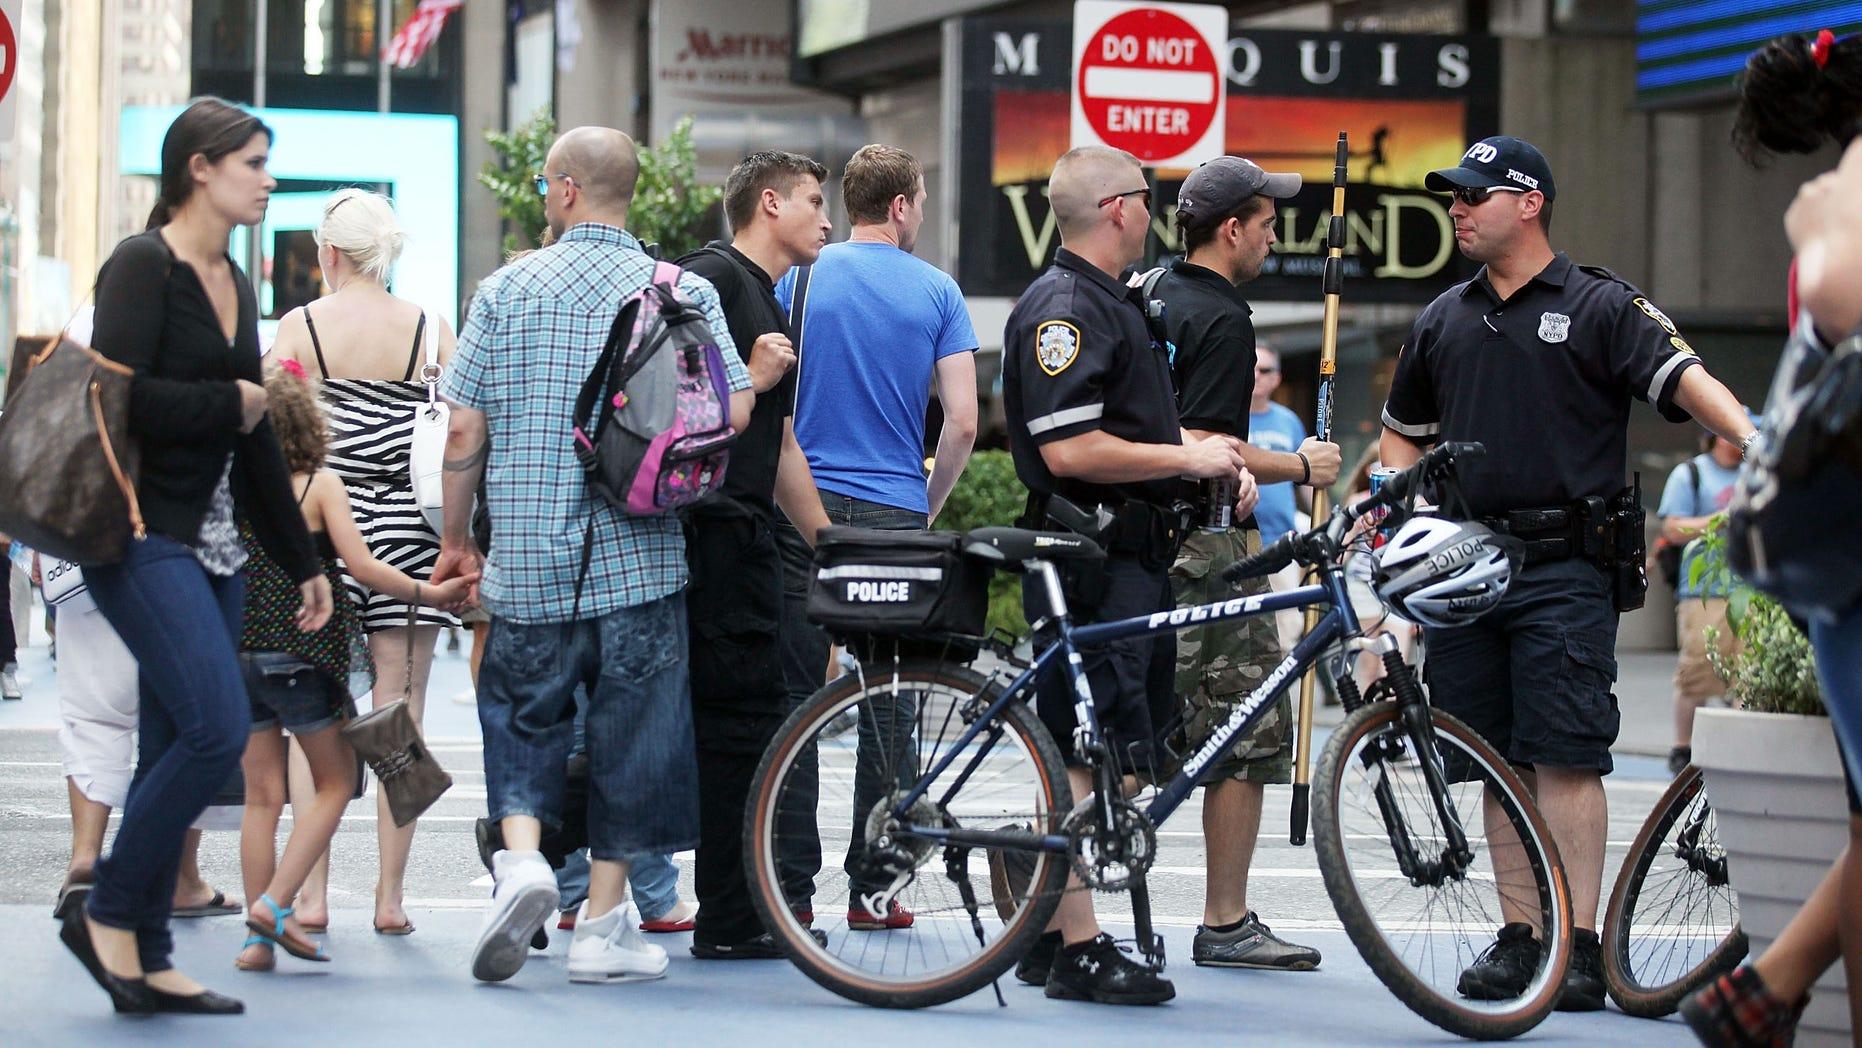 > on June 29, 2011 in New York City.